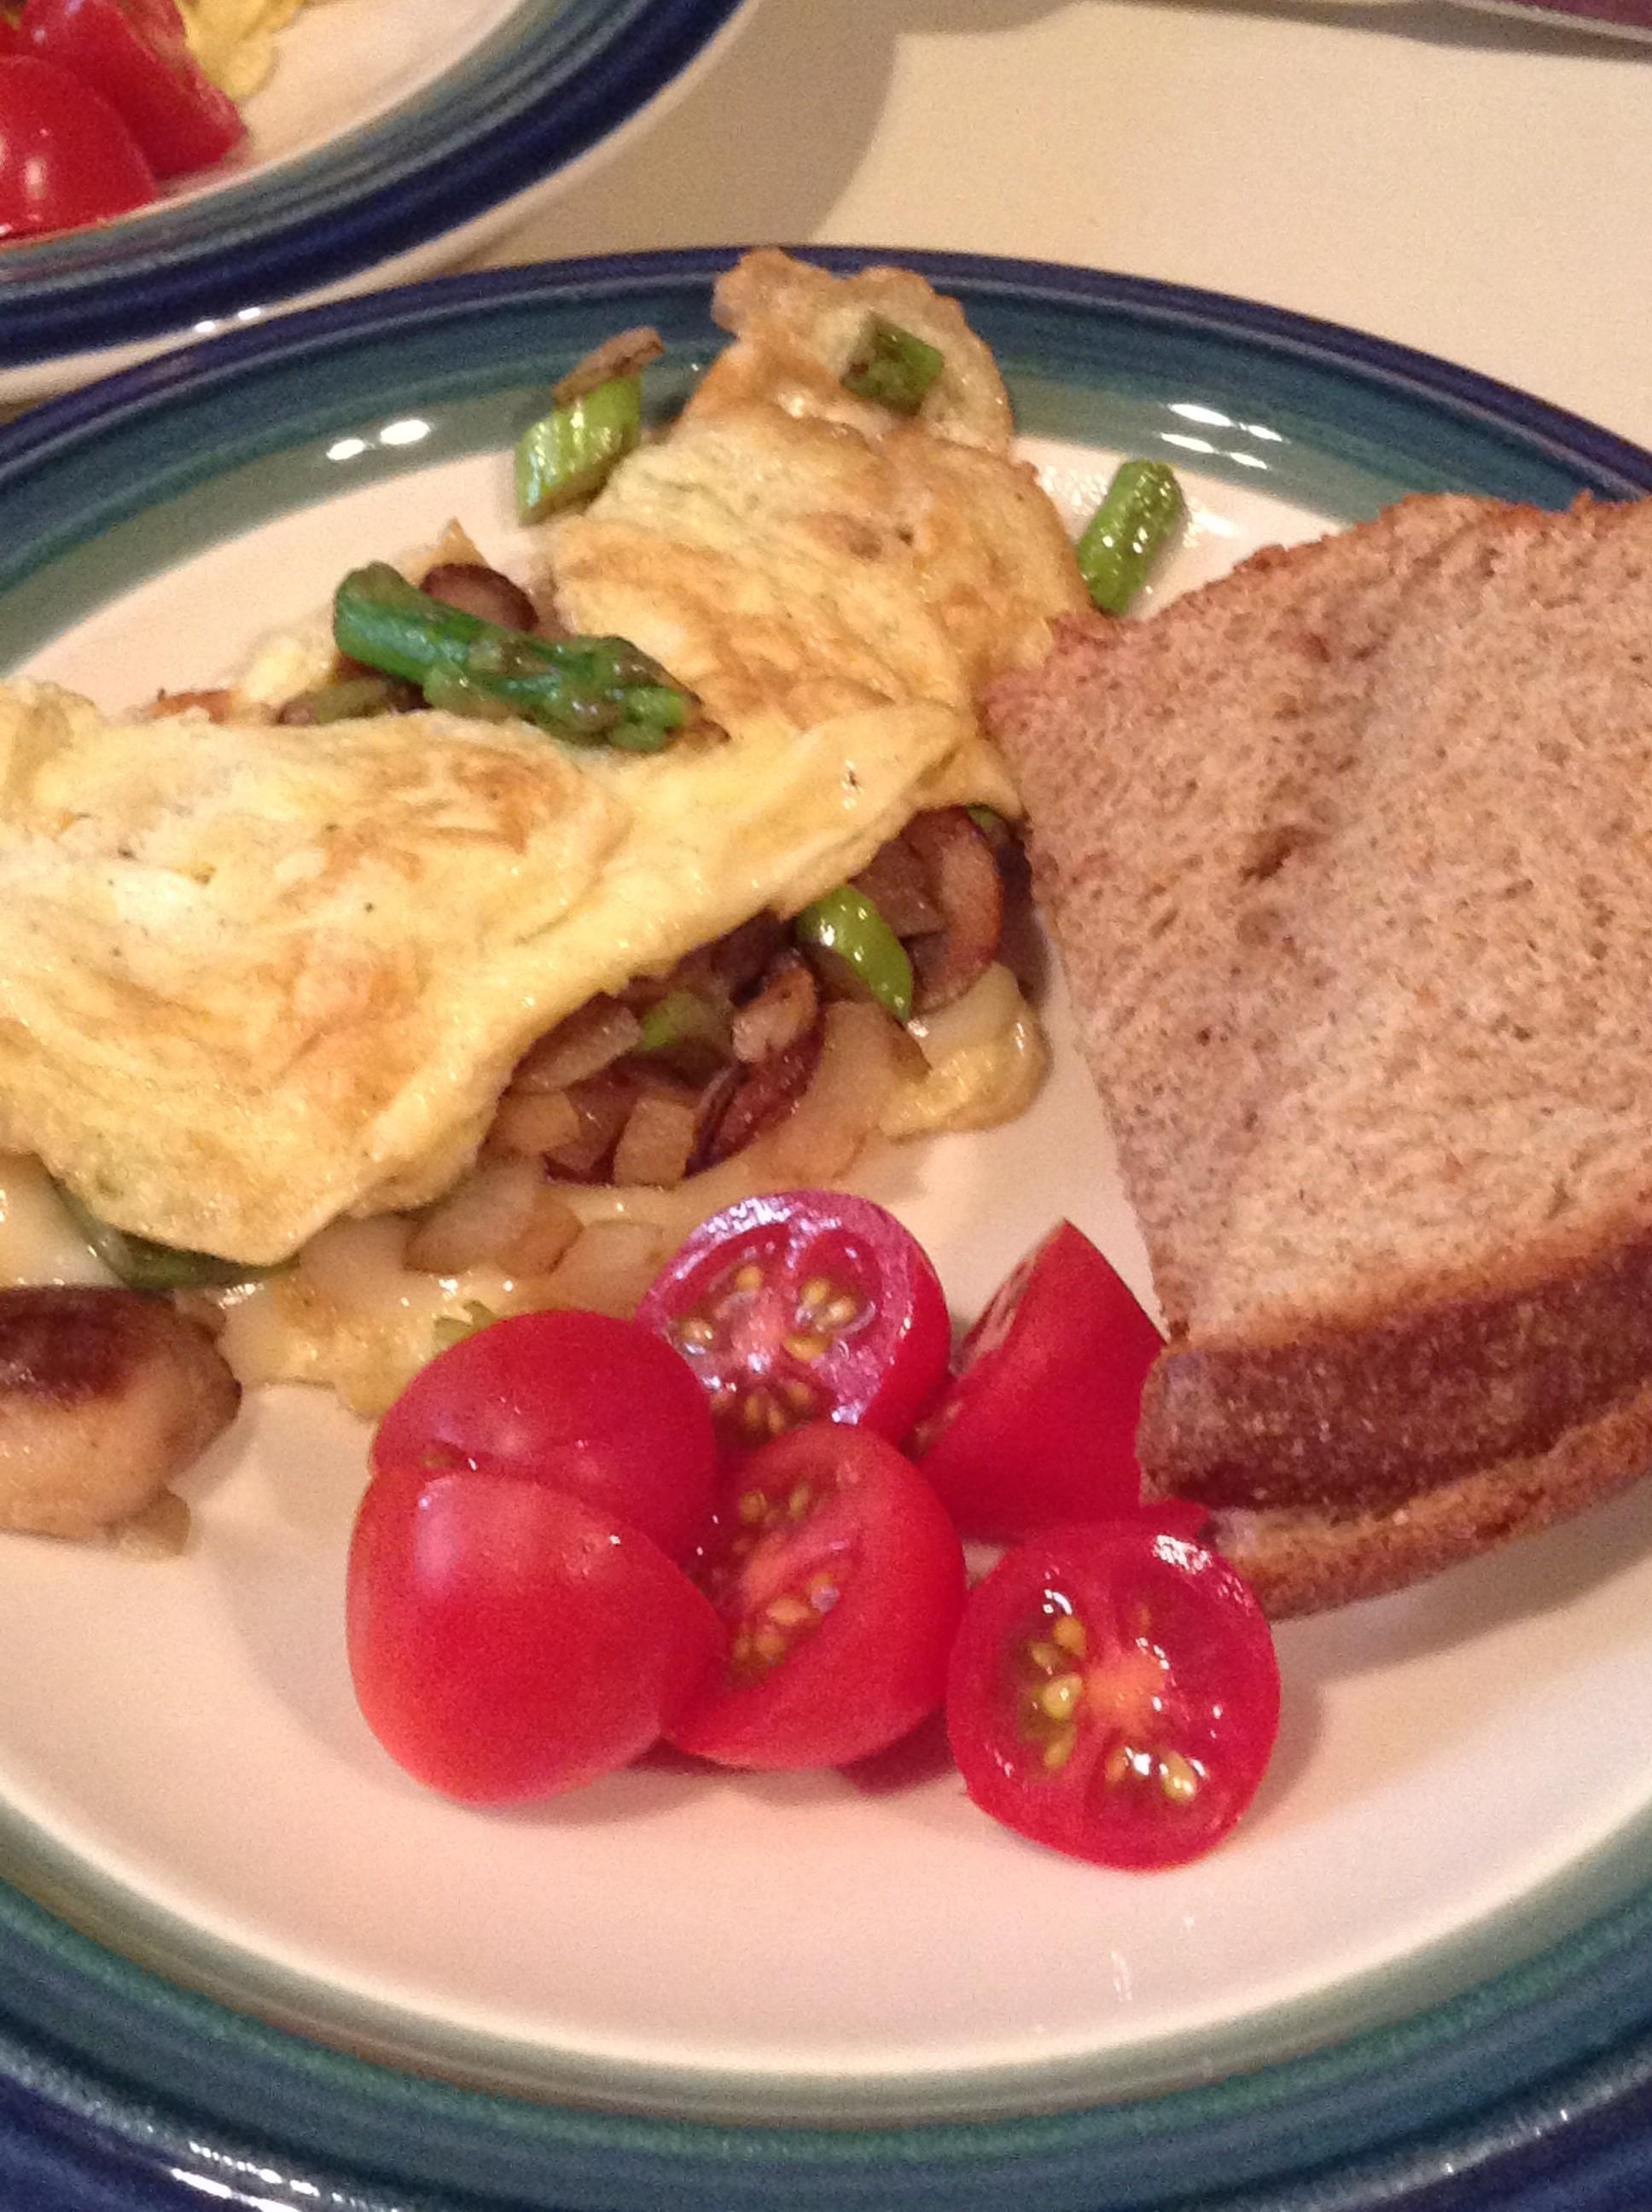 Asparagus and Mushroom Omelette